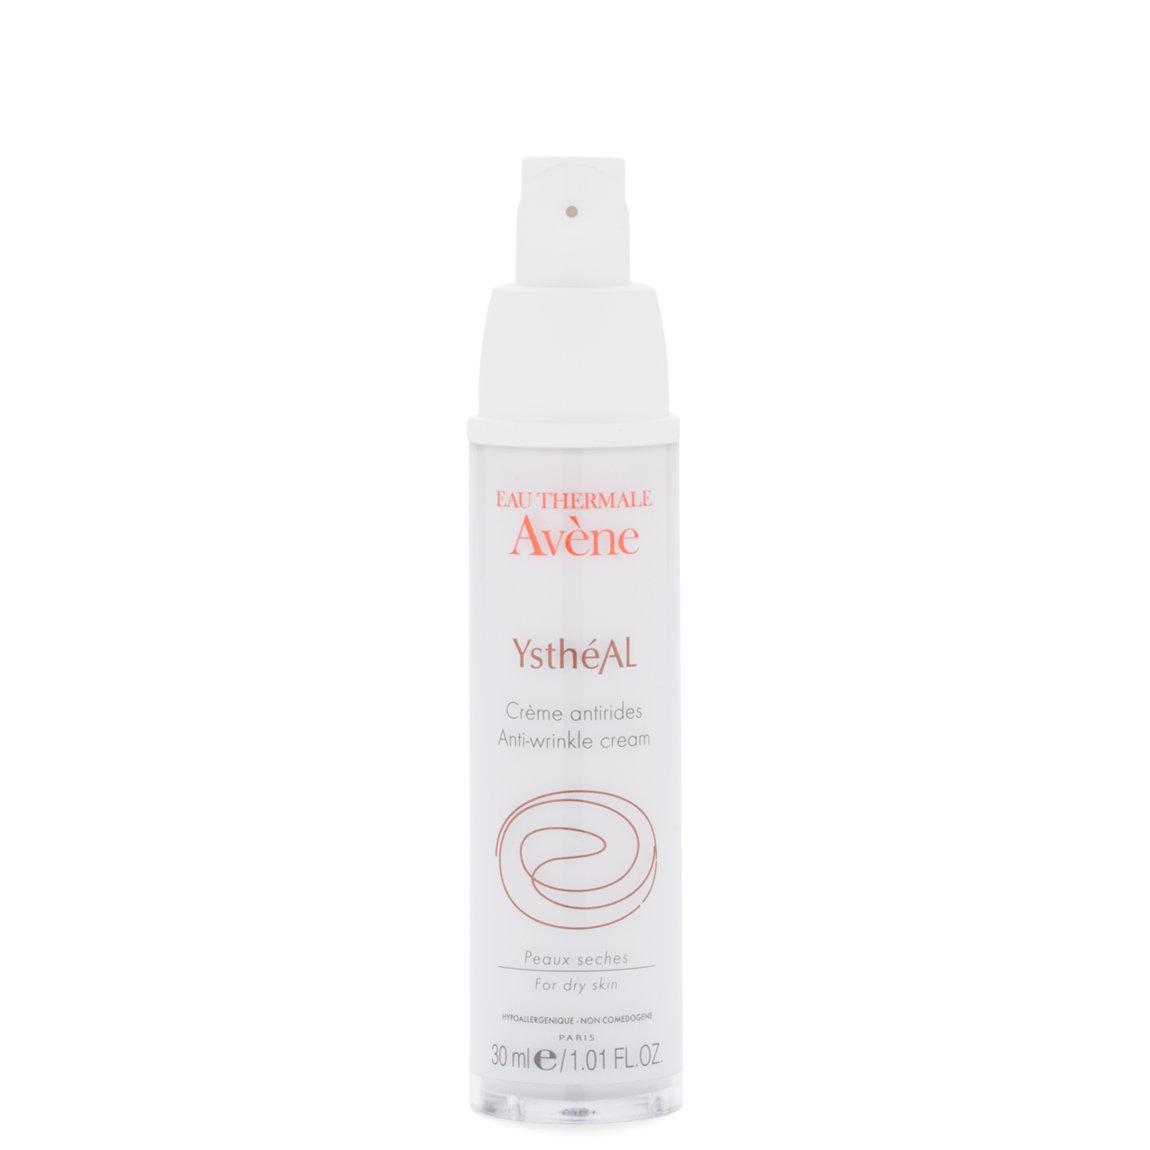 Eau Thermale Avène Ystheal Anti-Wrinkle Cream